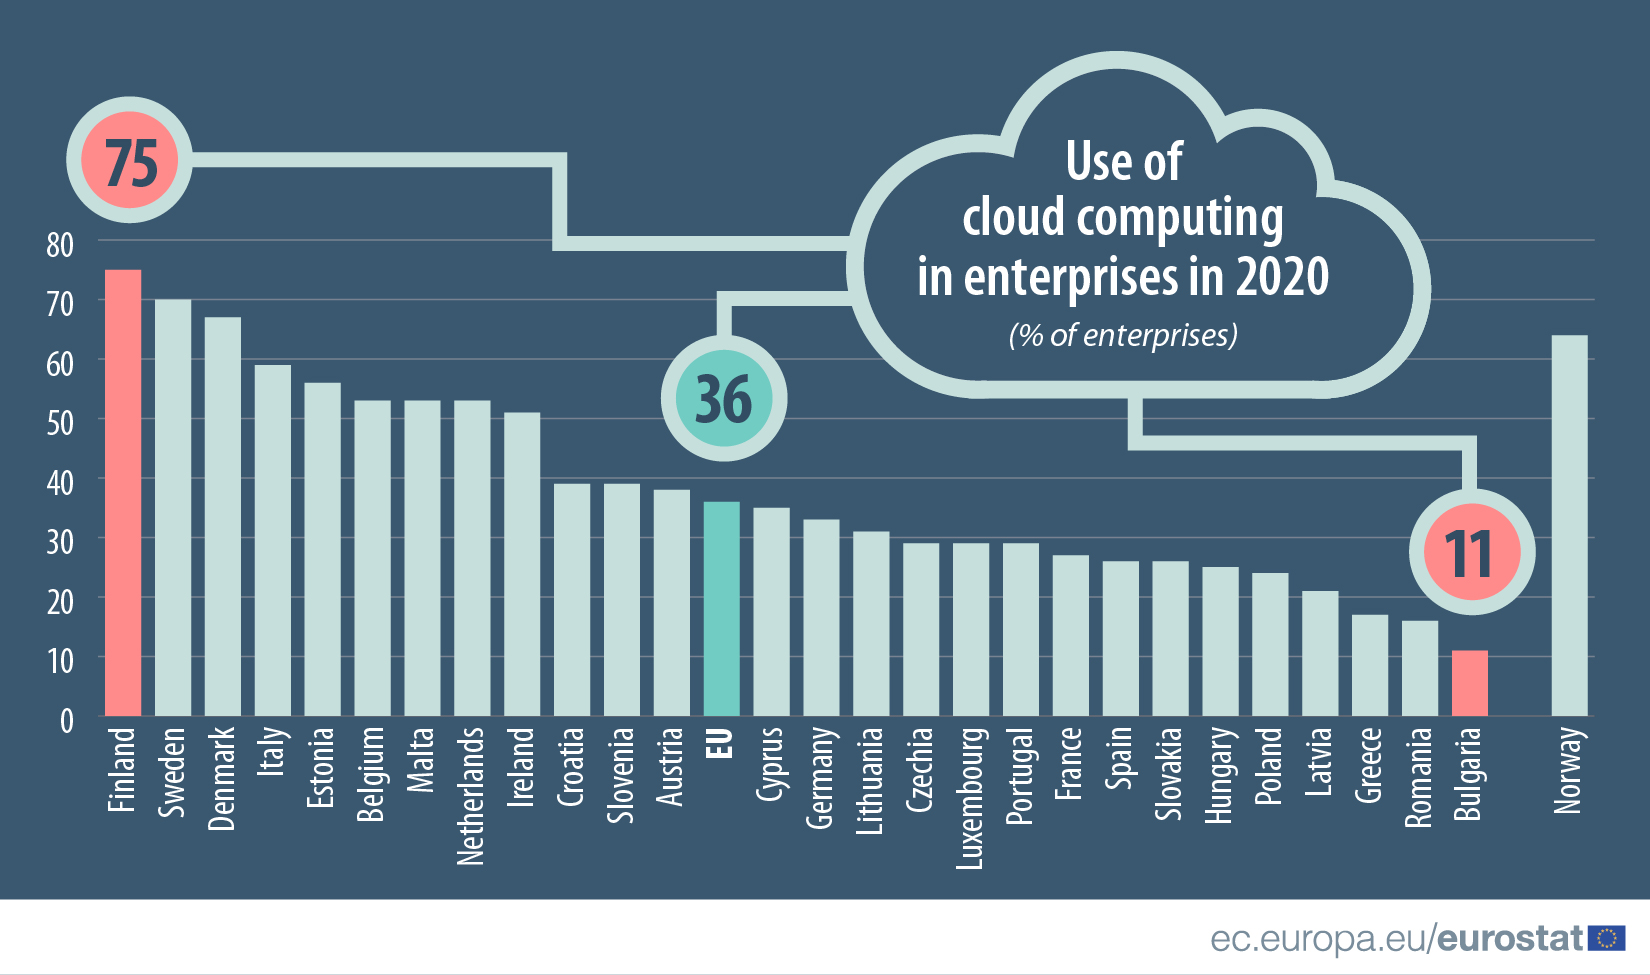 Cloud computing in enterprises in 2020